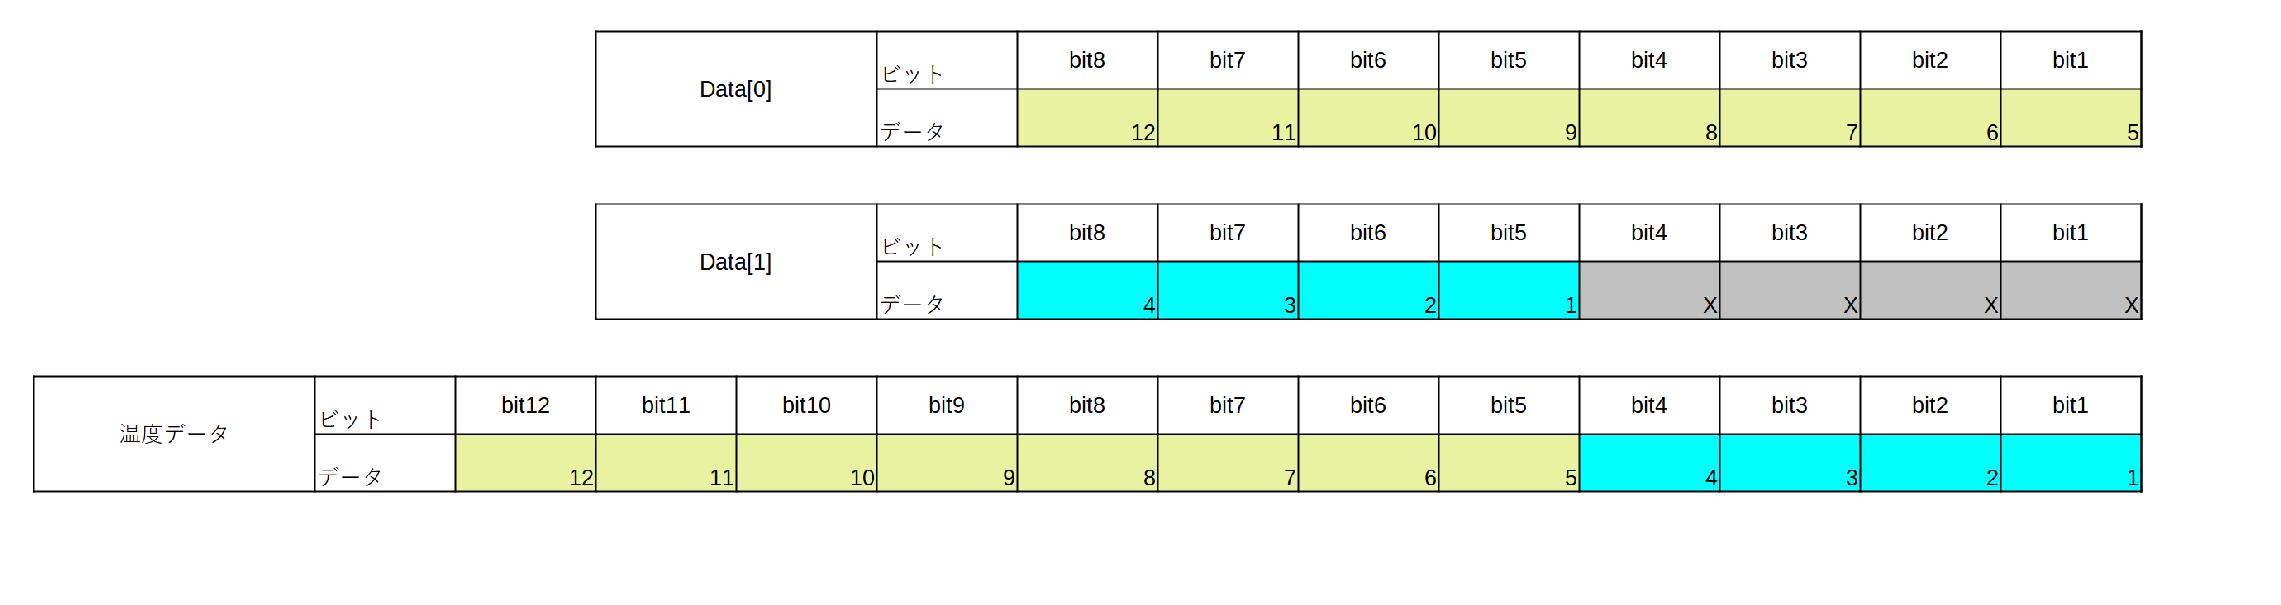 TMP102の取得データのイメージ図